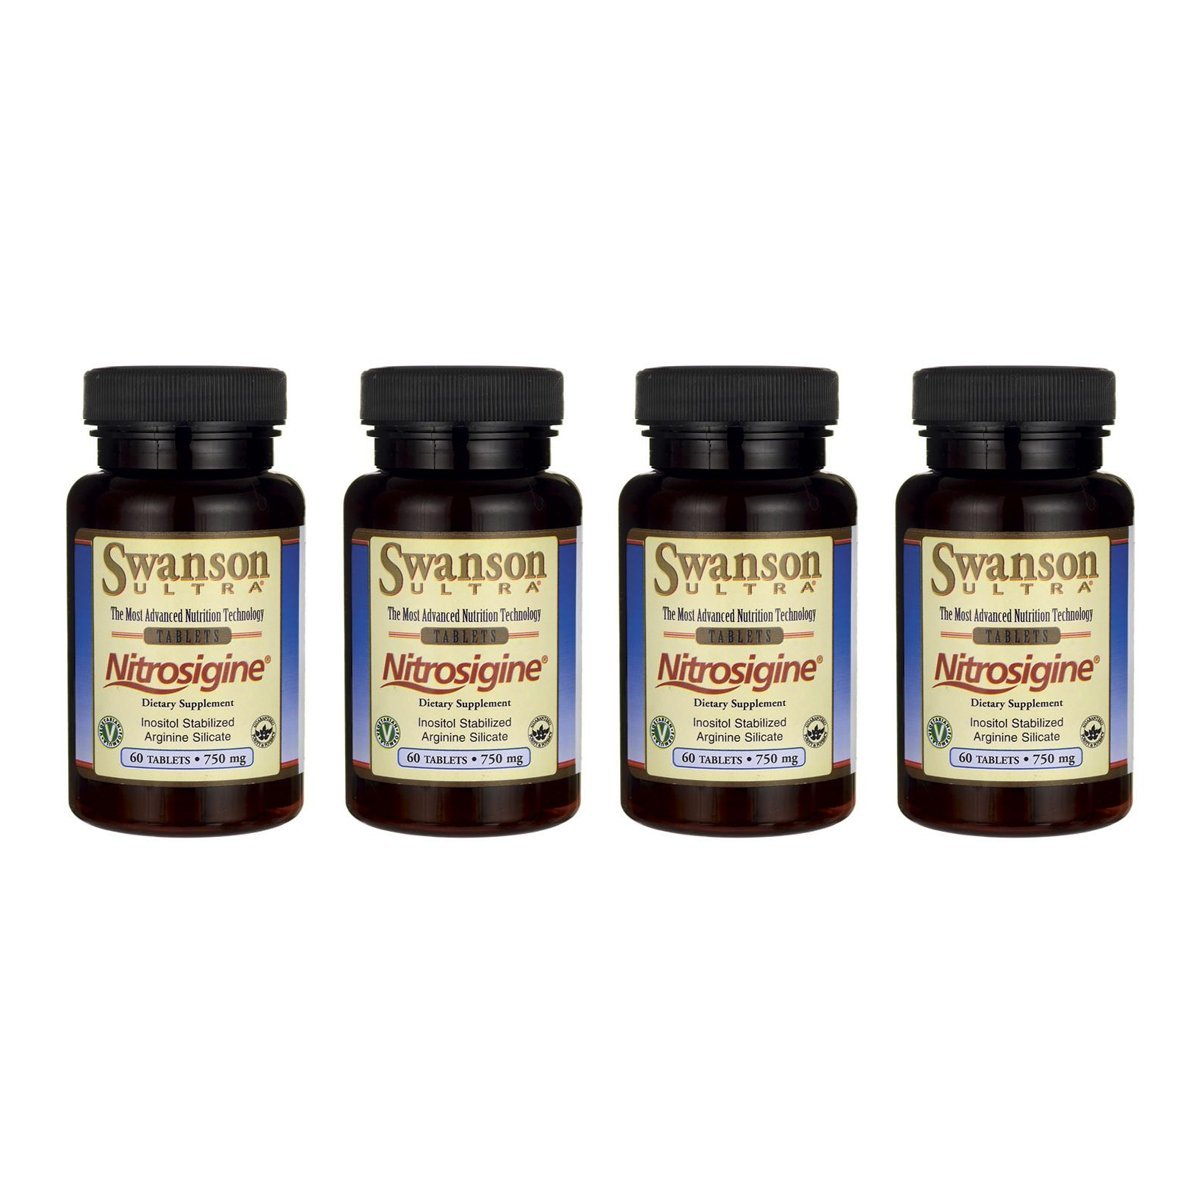 Swanson Nitrosigine Inositol Stabilized Arginine Silicate 60 Tabs